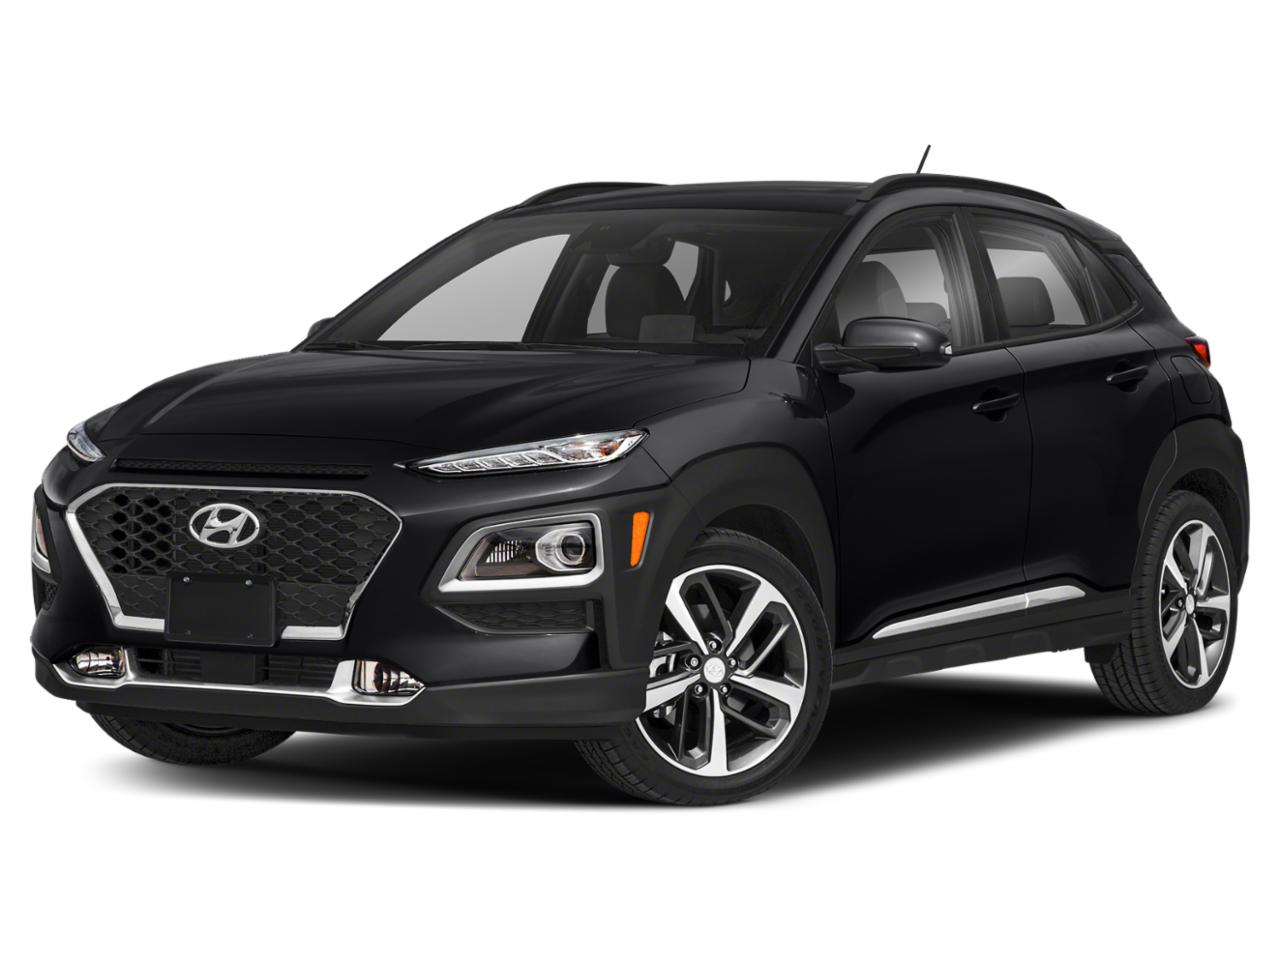 2020 Hyundai Kona Vehicle Photo in Merrillville, IN 46410